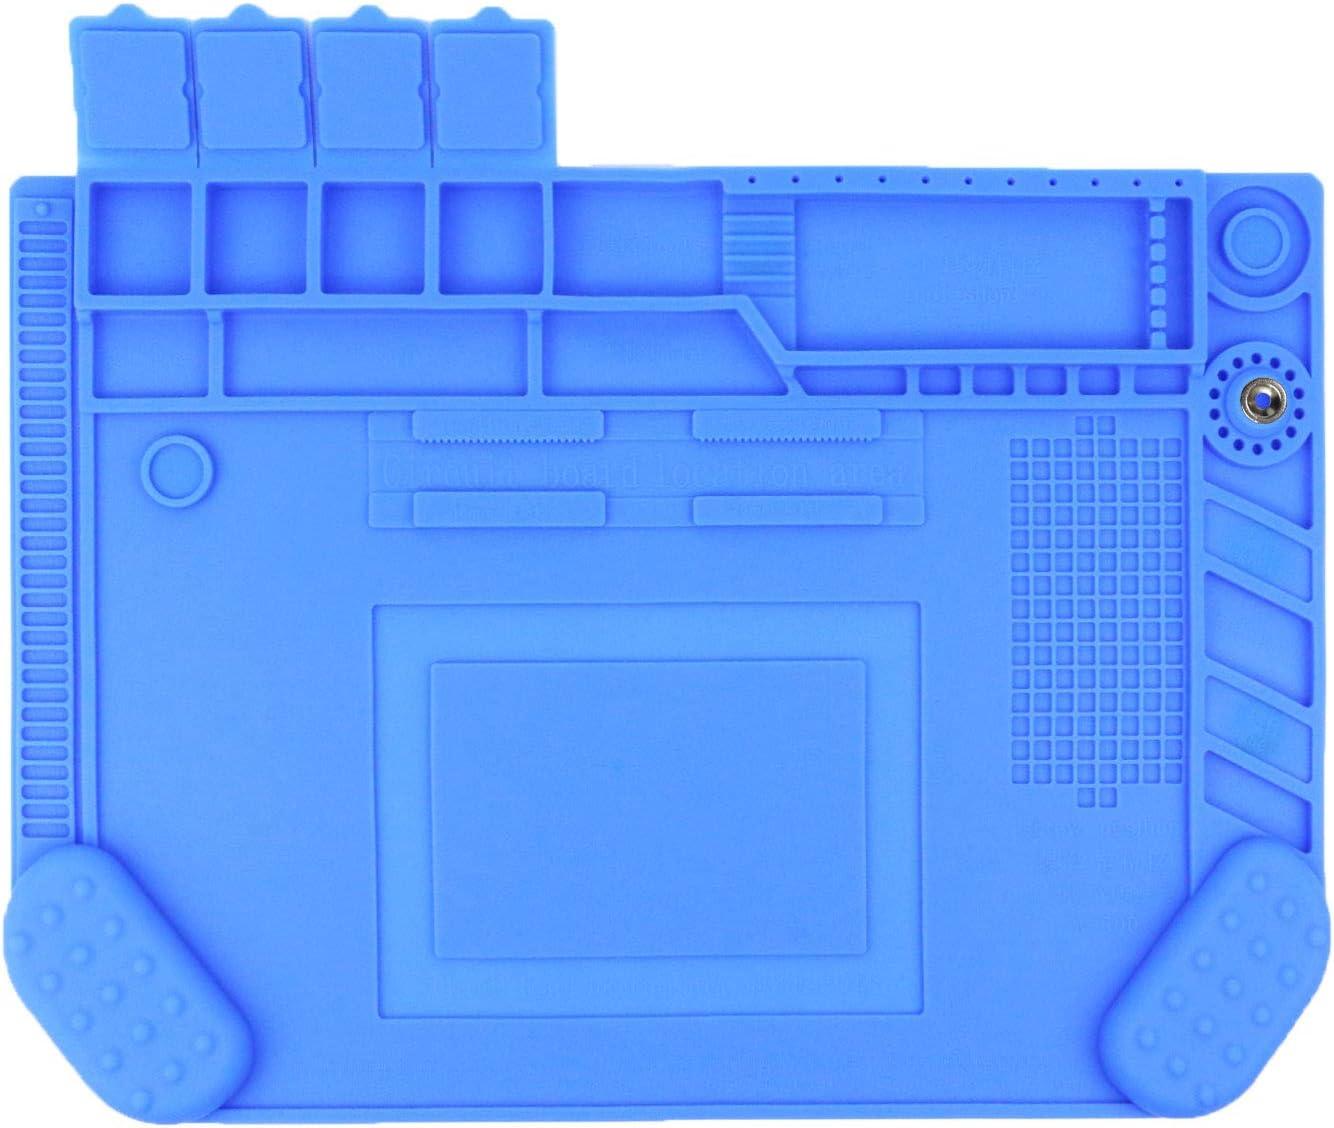 Large Soldering Mat Silicone Heat Resistant Mat Repair Mat 18.8 x12.6 Design with Wrist Guards Electronics Mat for Heat Gun,Soldering Iron,Soldering Station,Cellphone Laptop Repair